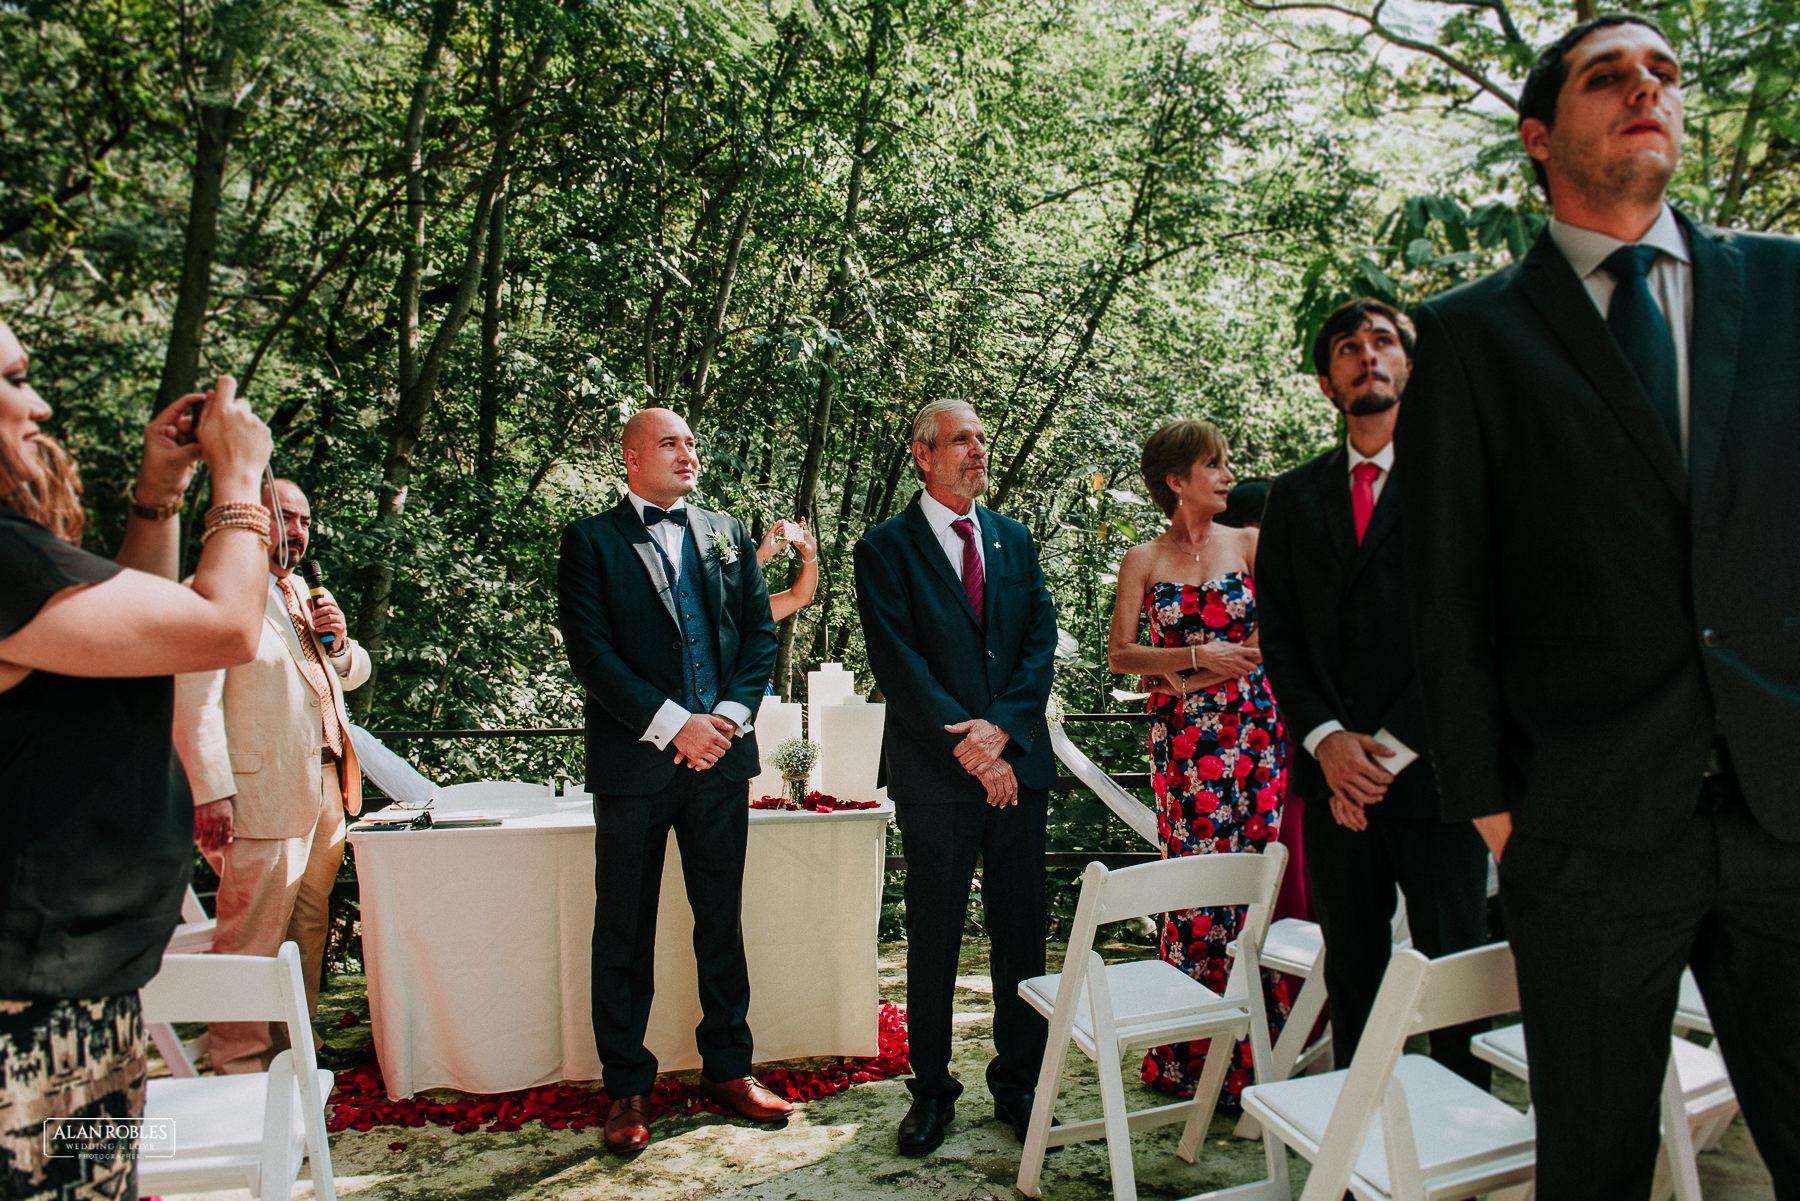 Fotografo de bodas guadalajara Alan Robles - Pinare terraza bistro 30